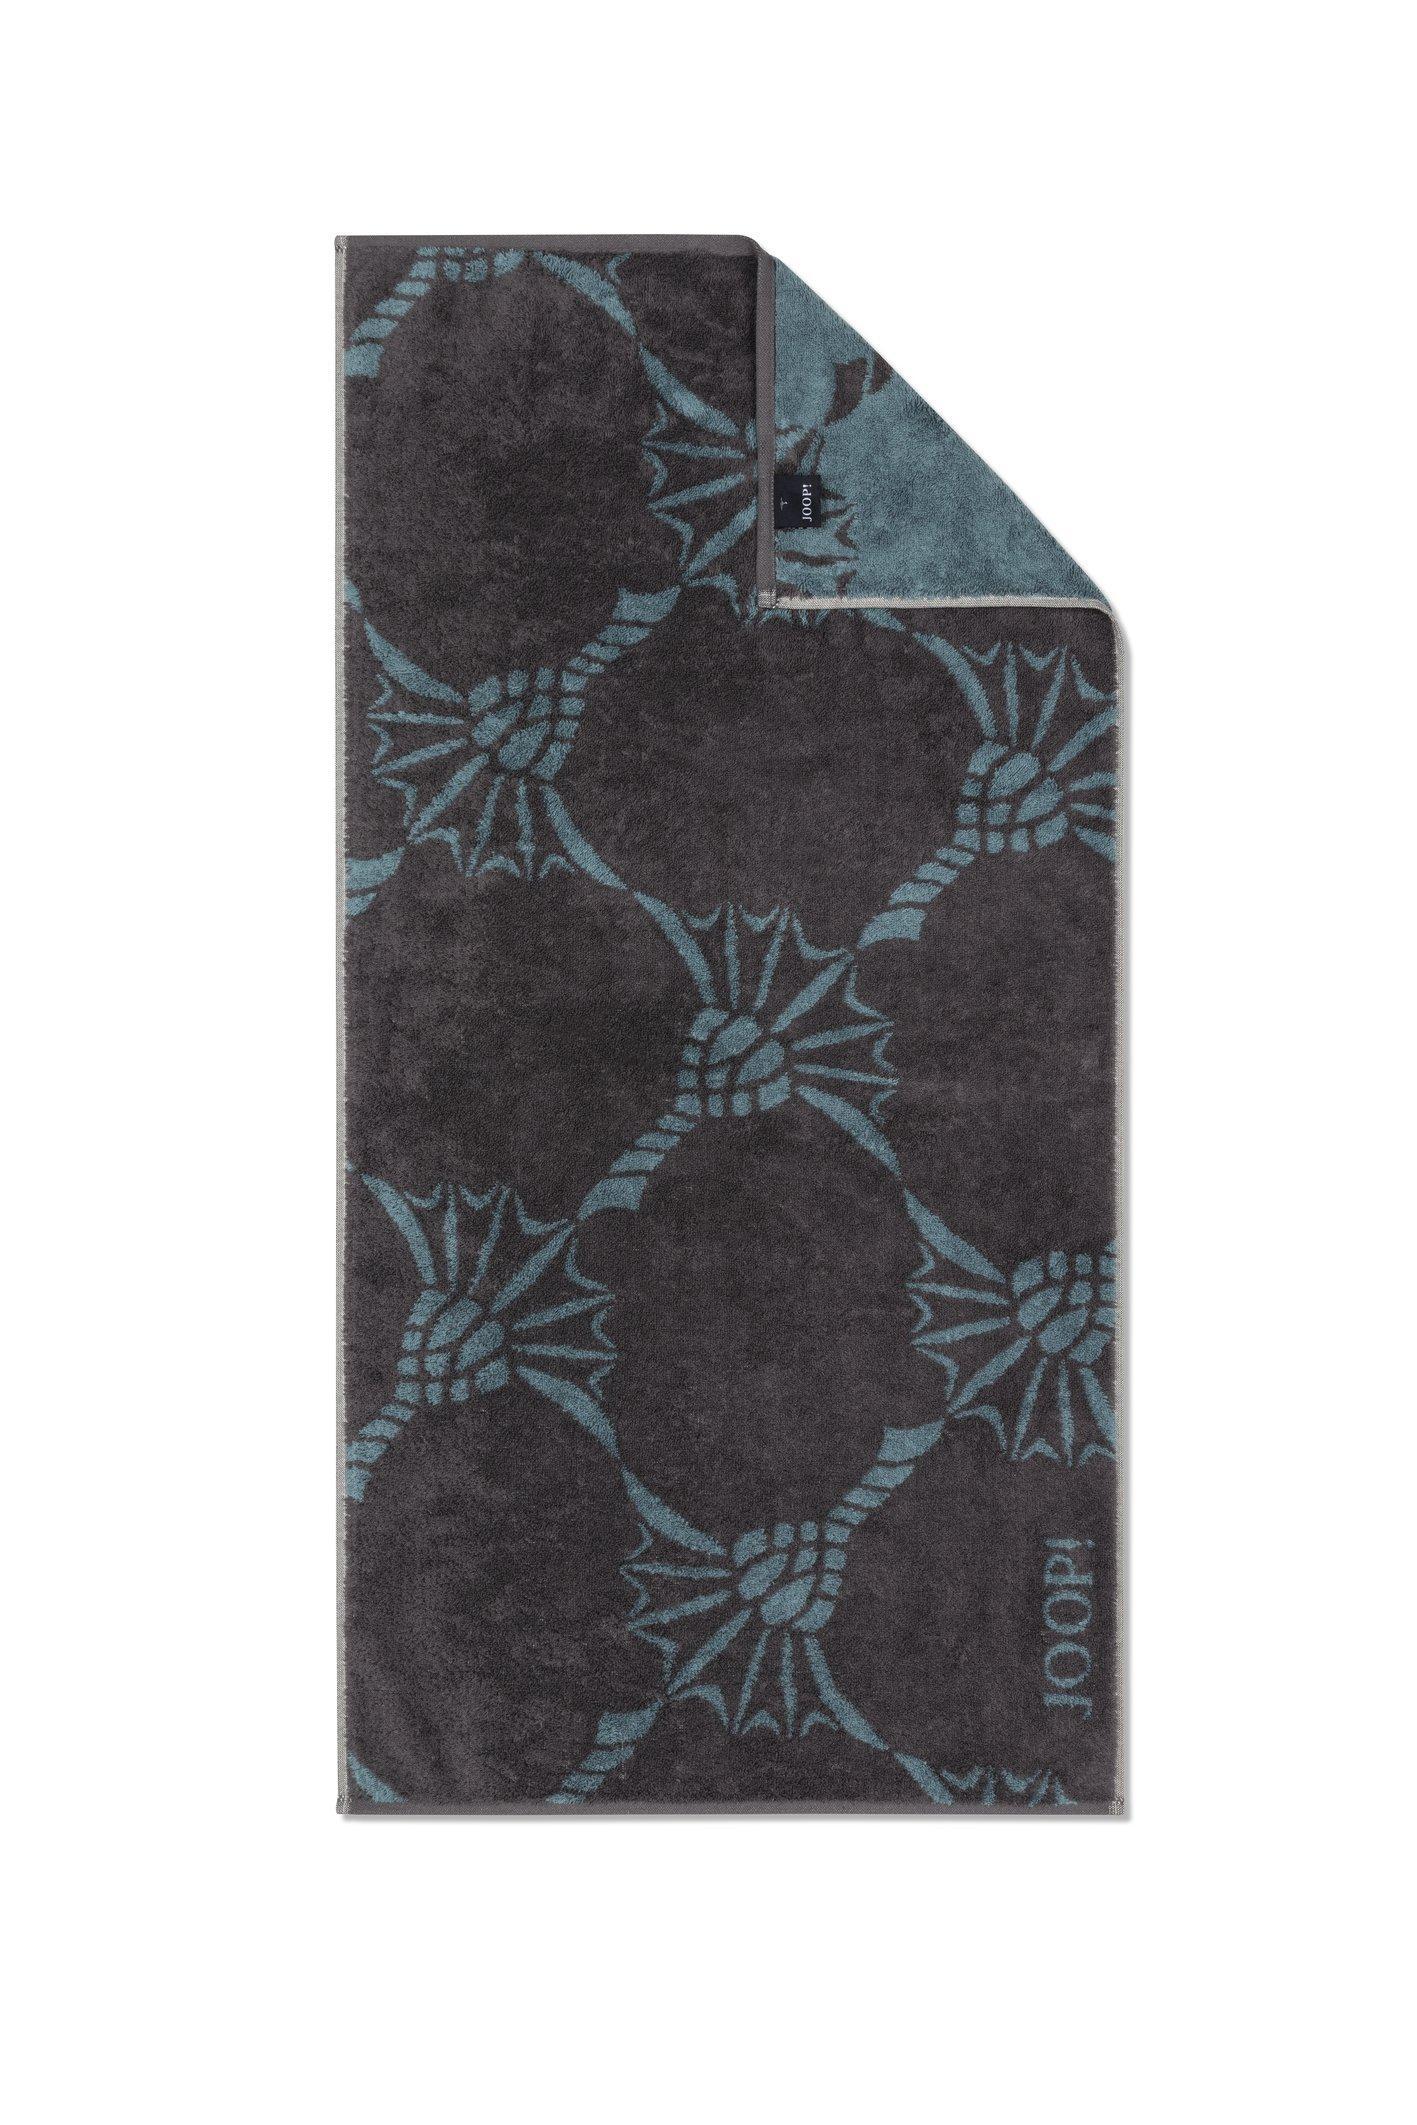 JOOP! Frottierkollektion Infinity Cornflower Zoom 1677-74 Graphite Duschtuch 80x150 cm